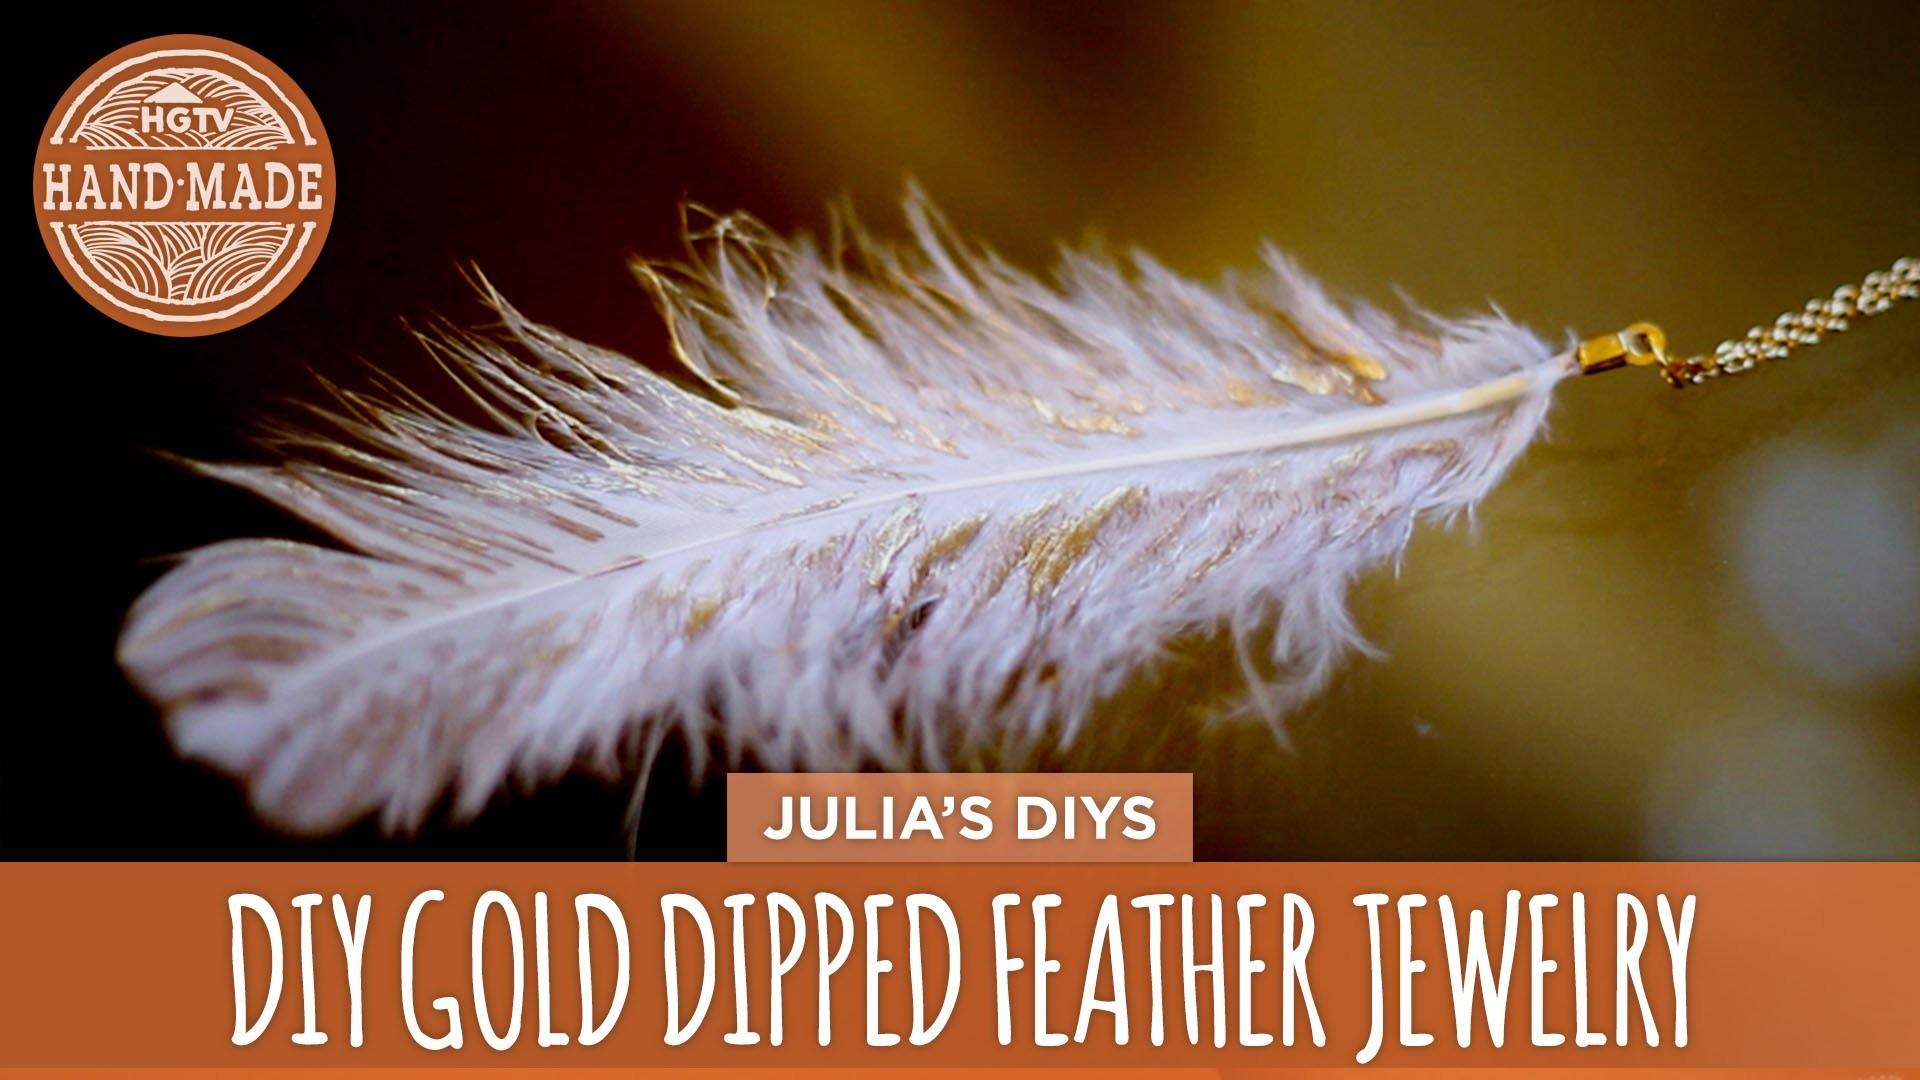 DIY Gold Dipped Feather Jewelry - HGTV Handmade